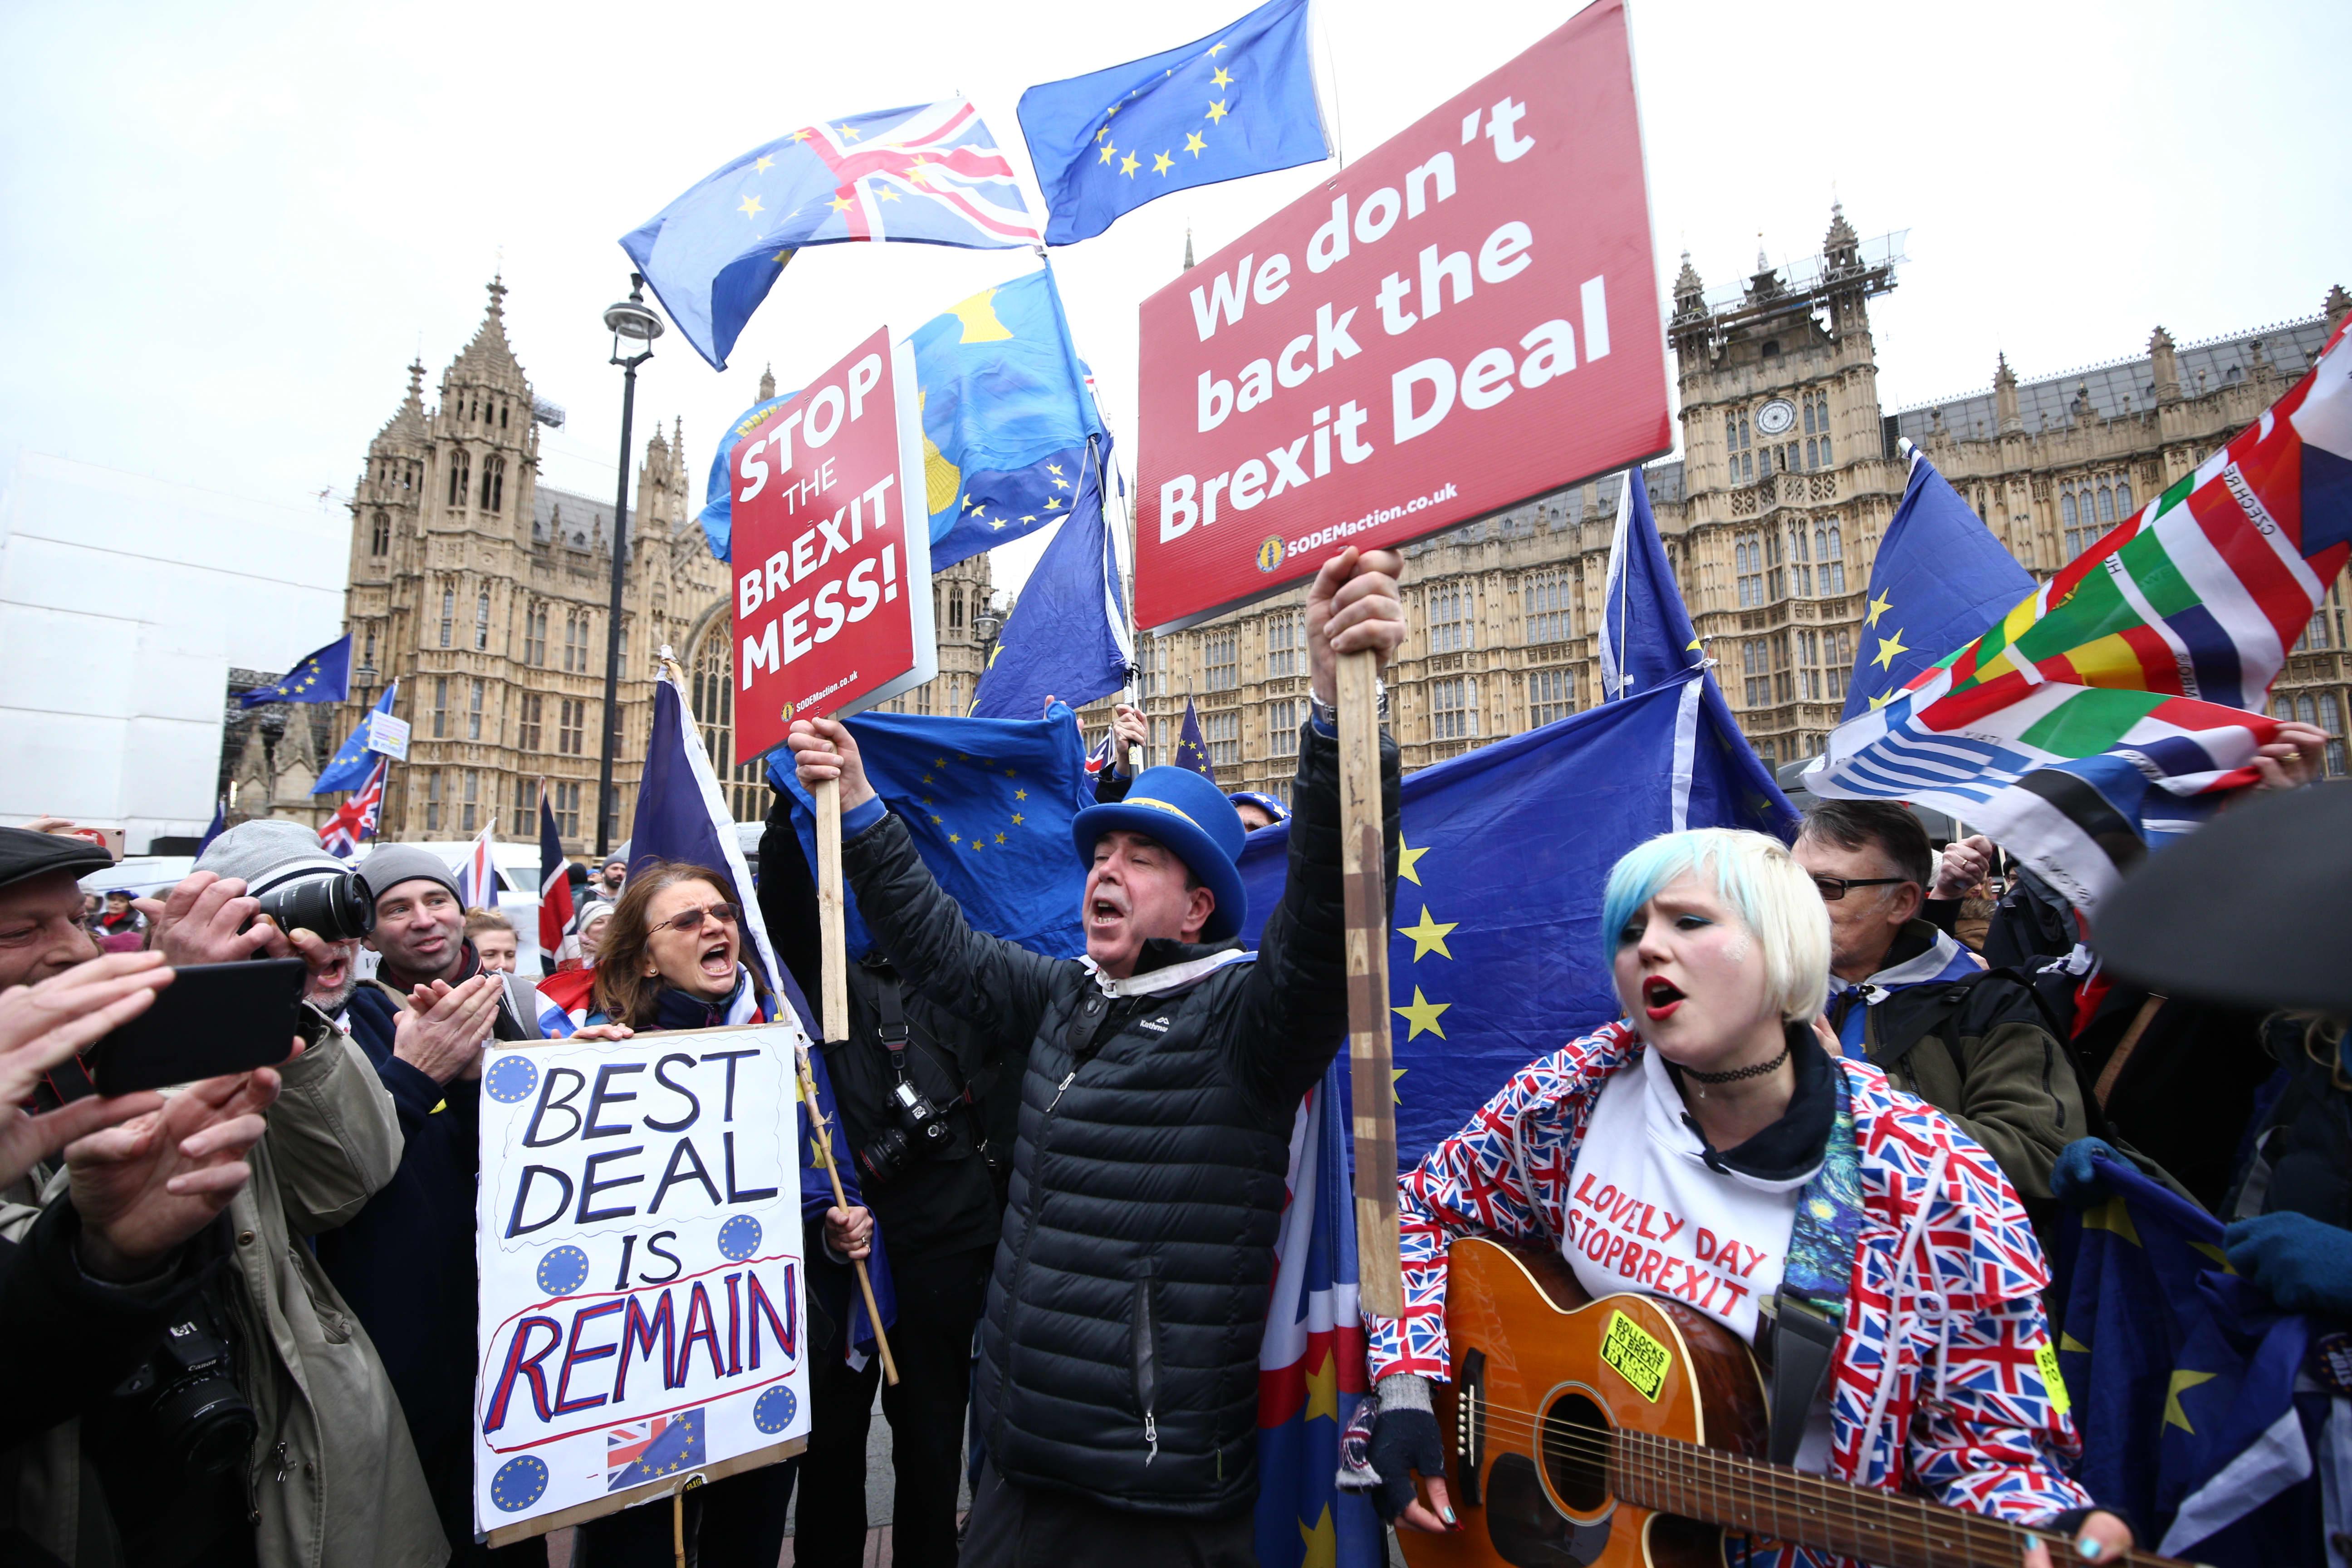 The EU — not Boris Johnson — will trigger a no-deal Brexit, says strategist